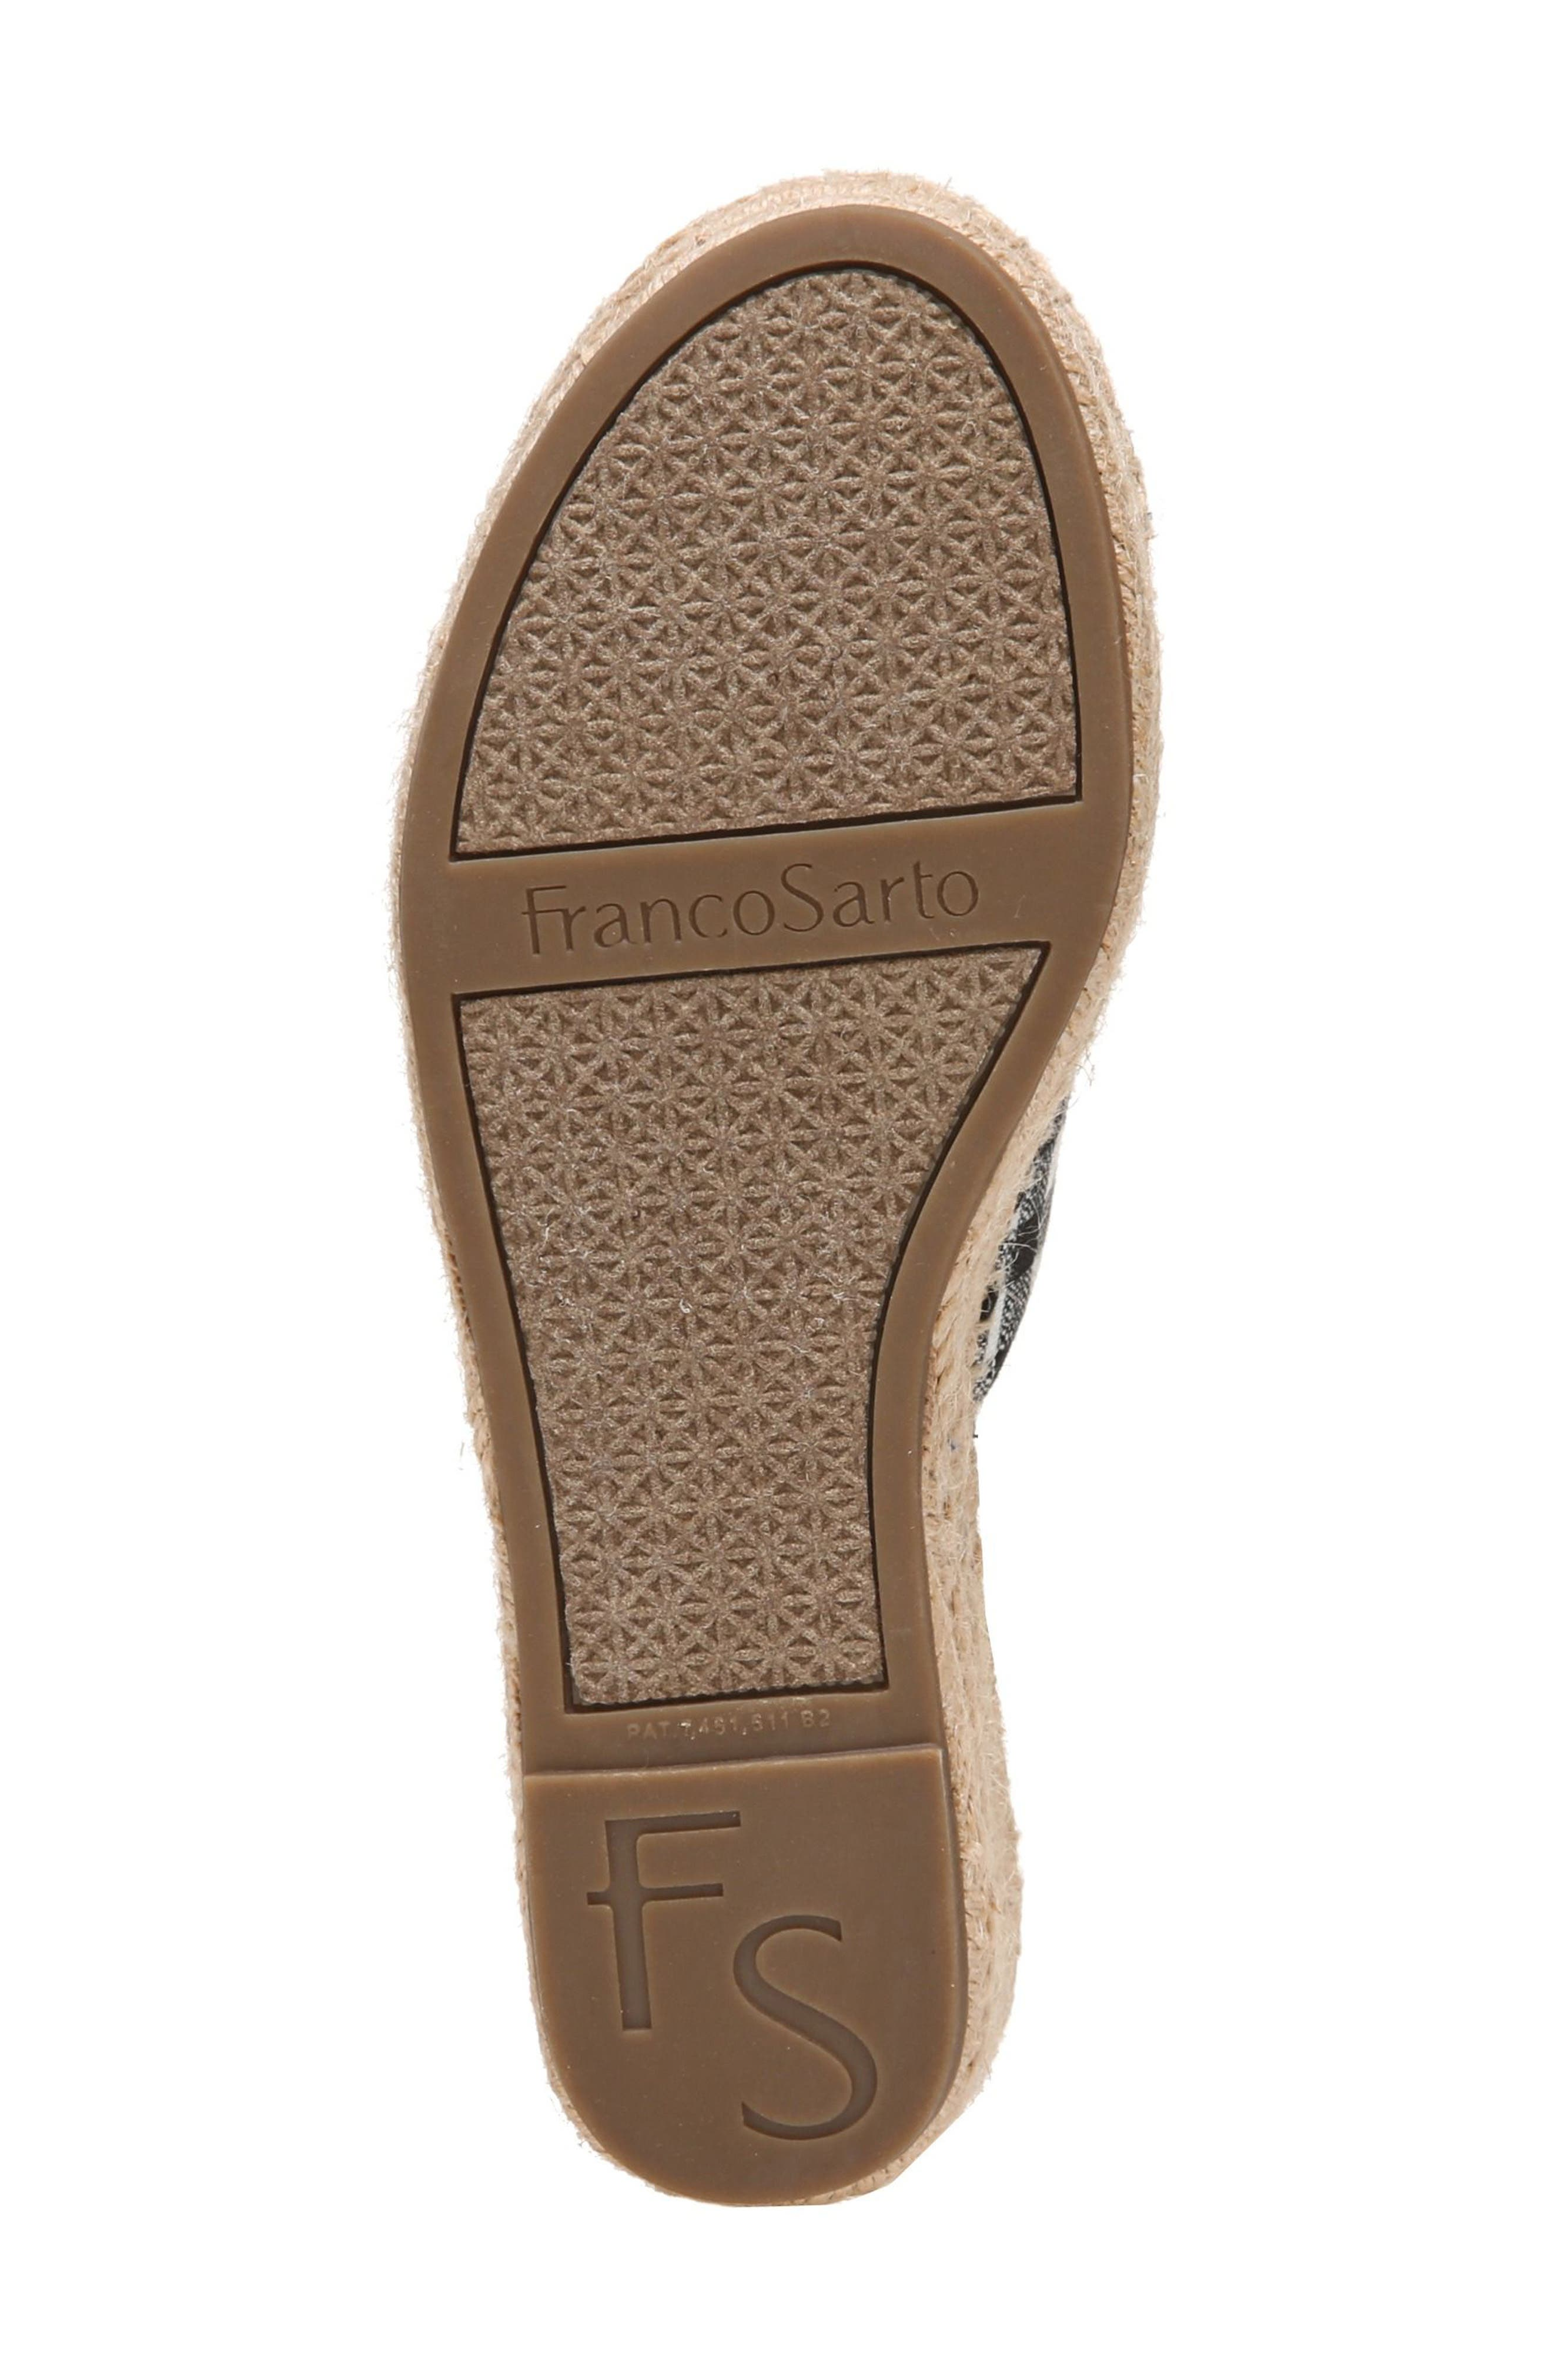 SARTO by Franco Sarto Pinot Platform Wedge Slide Sandal,                             Alternate thumbnail 6, color,                             BLACK/ WHITE